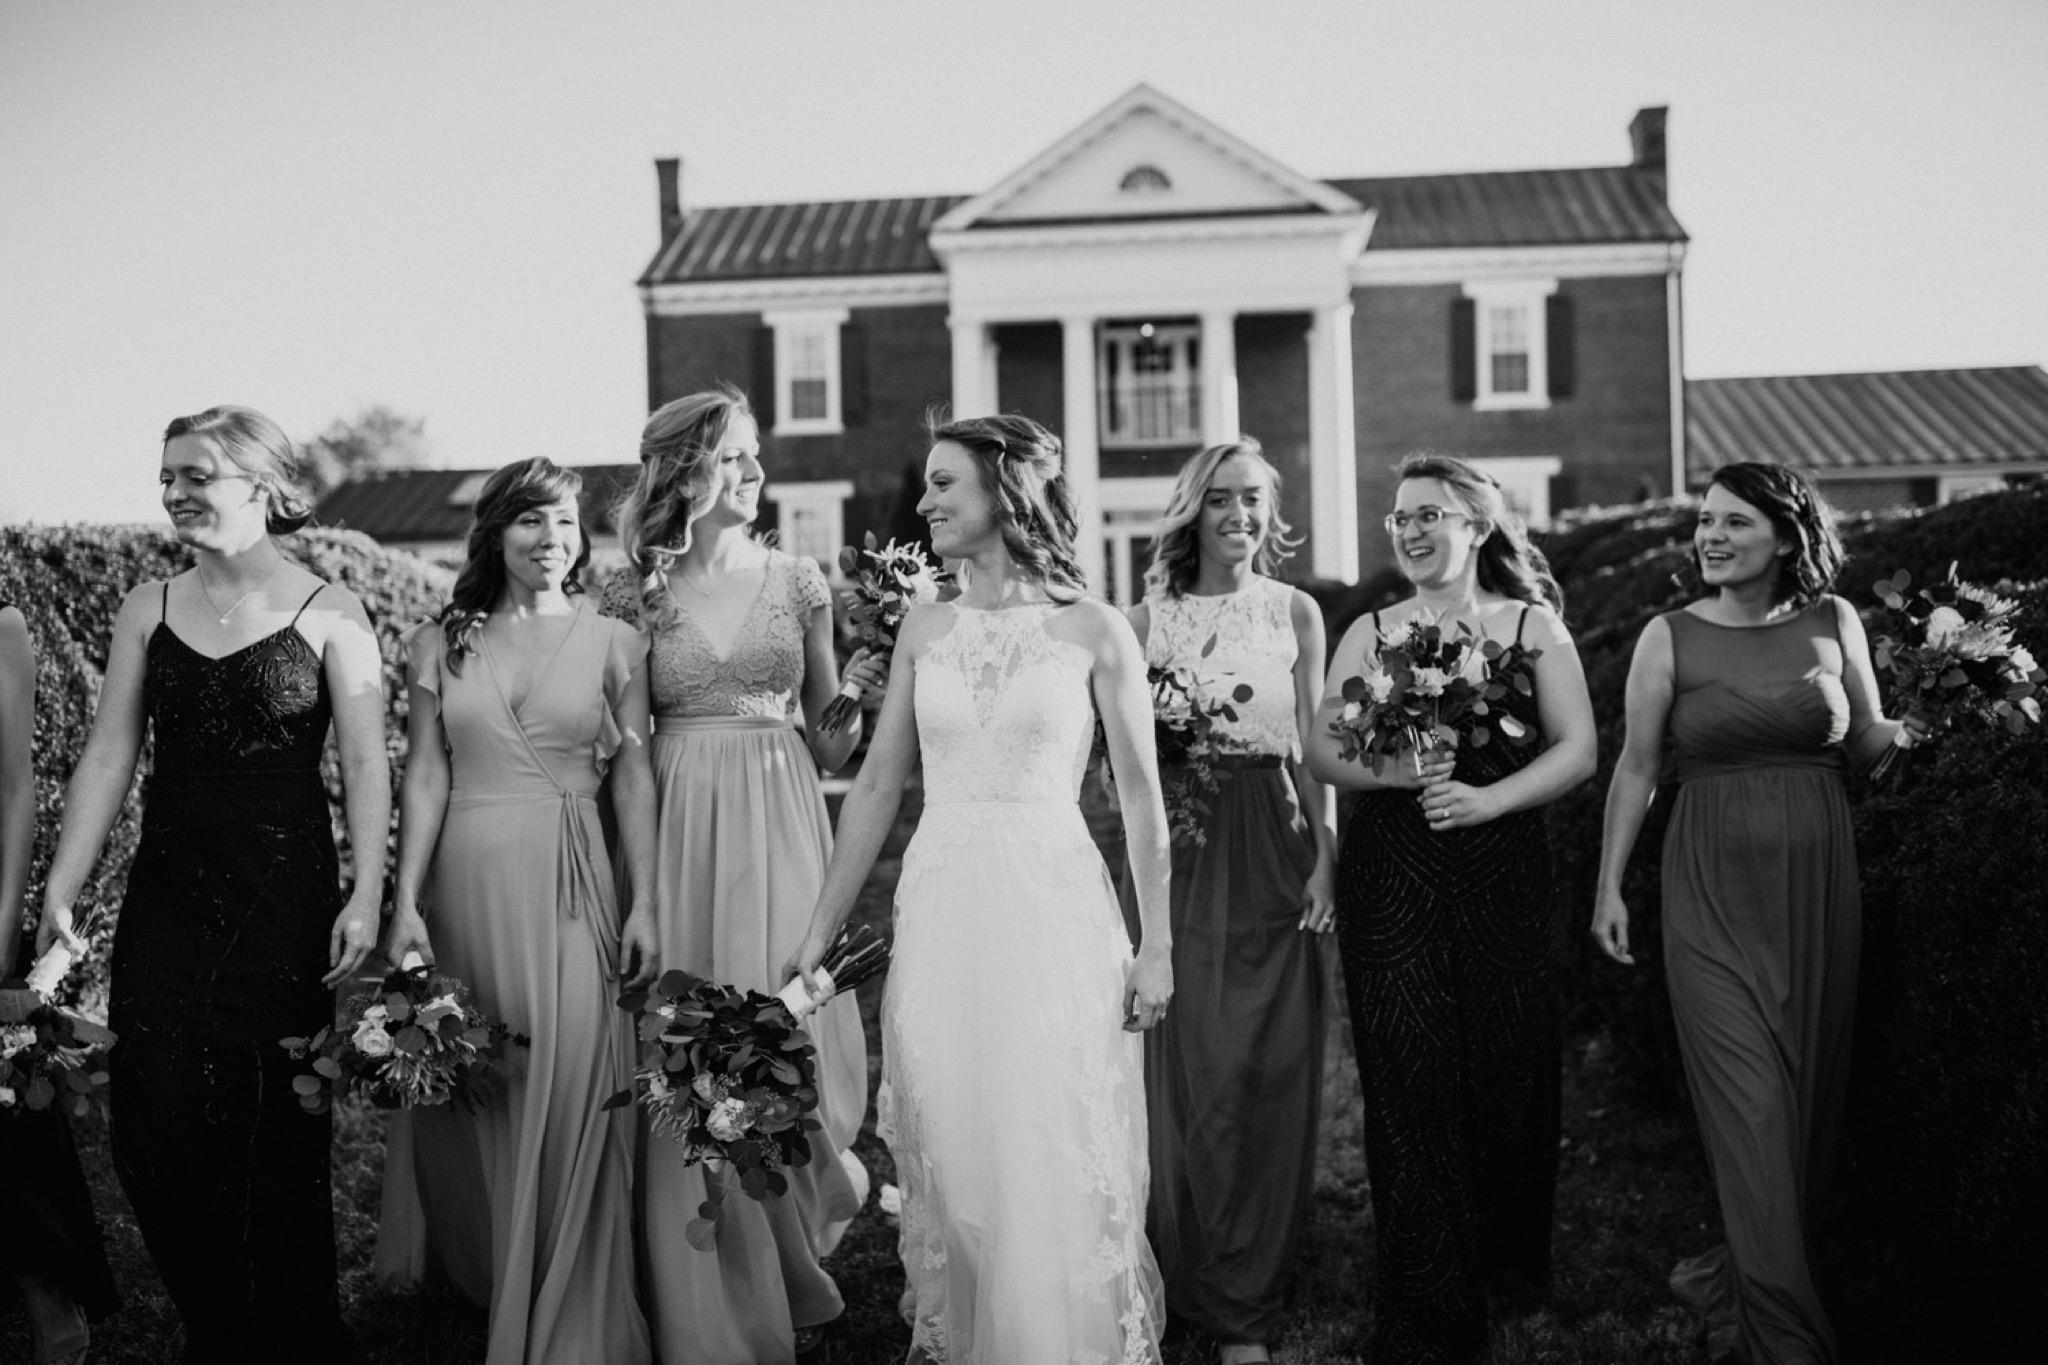 62_West Manor Estate Weddings - Pat Cori Photography-131_VirginiaWeddingPhotographer_bridesmaids_WestManorEstate_Portraits_Wedding.jpg